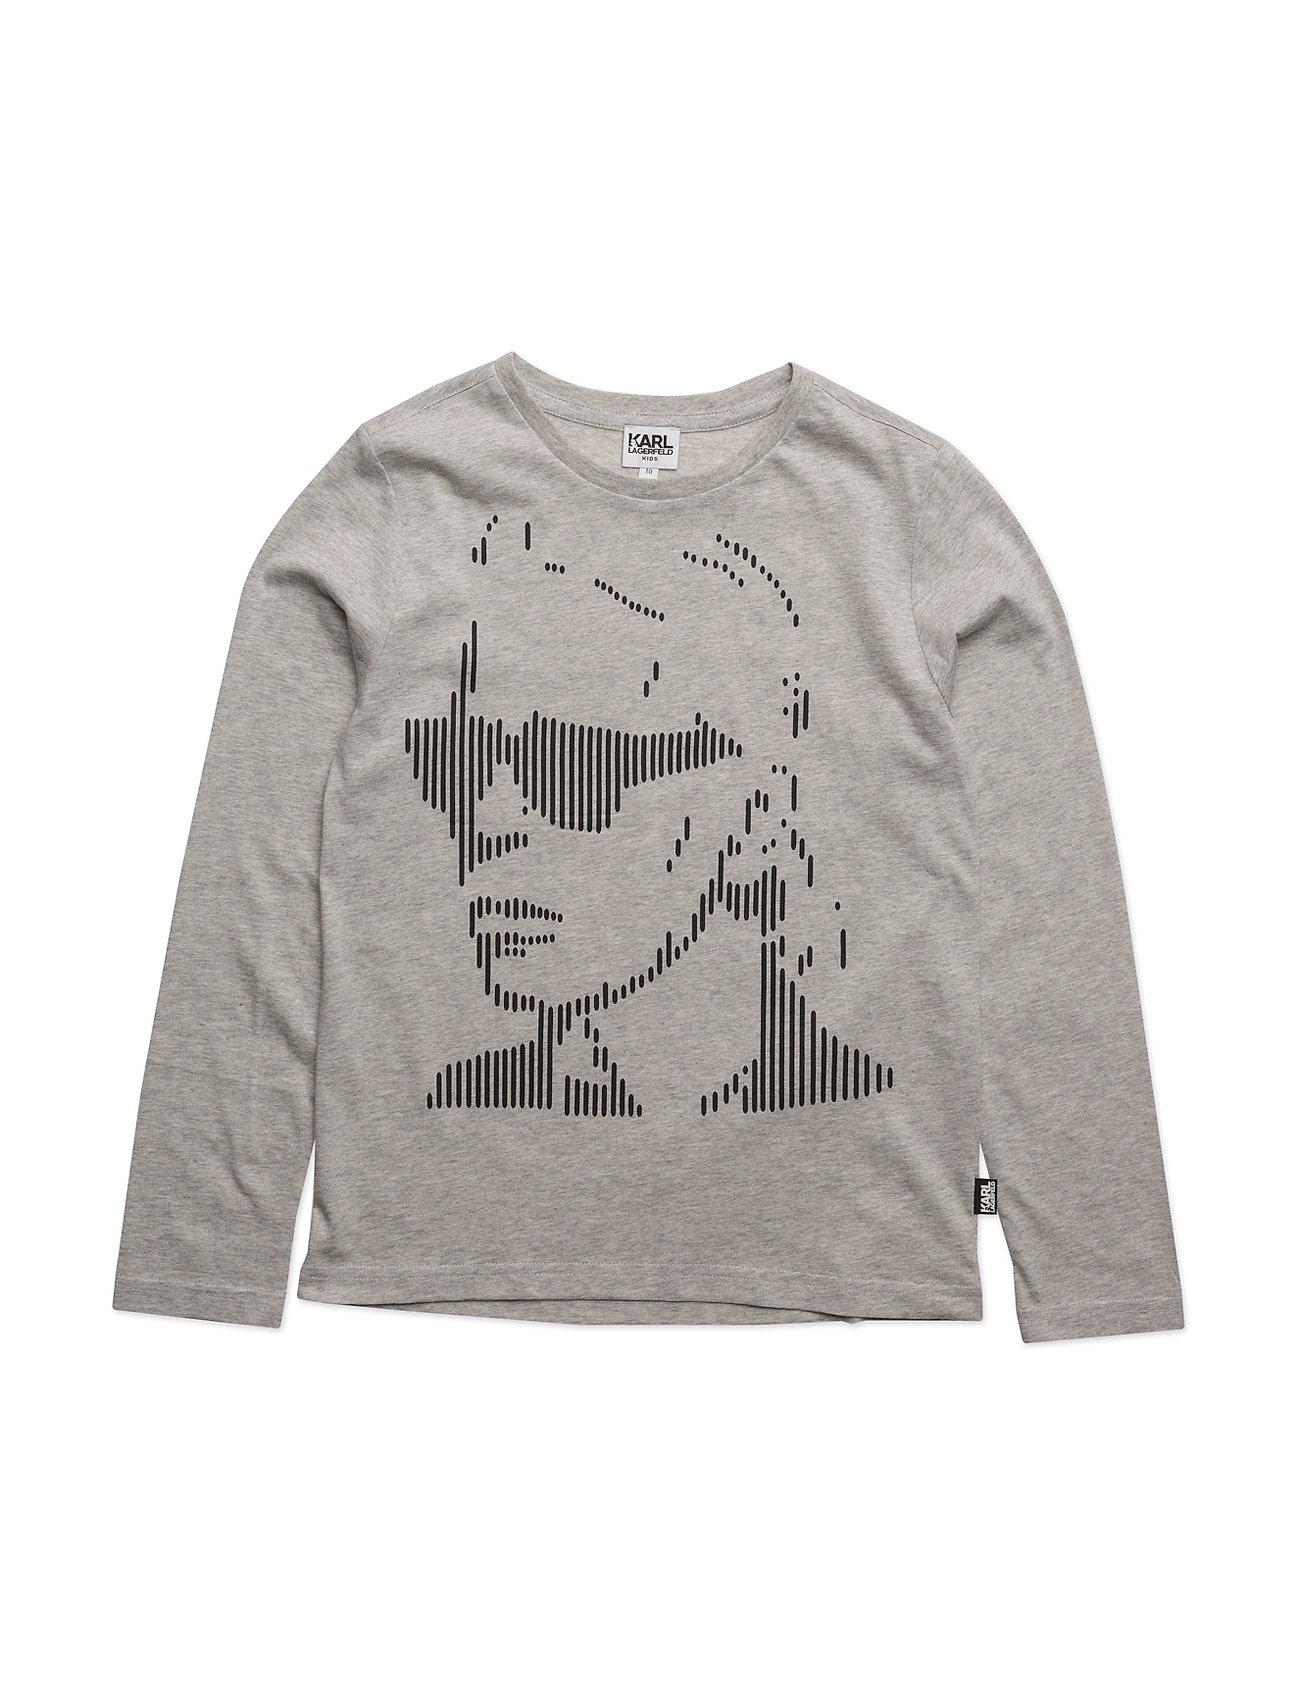 karl lagerfeld T-shirt på boozt.com dk